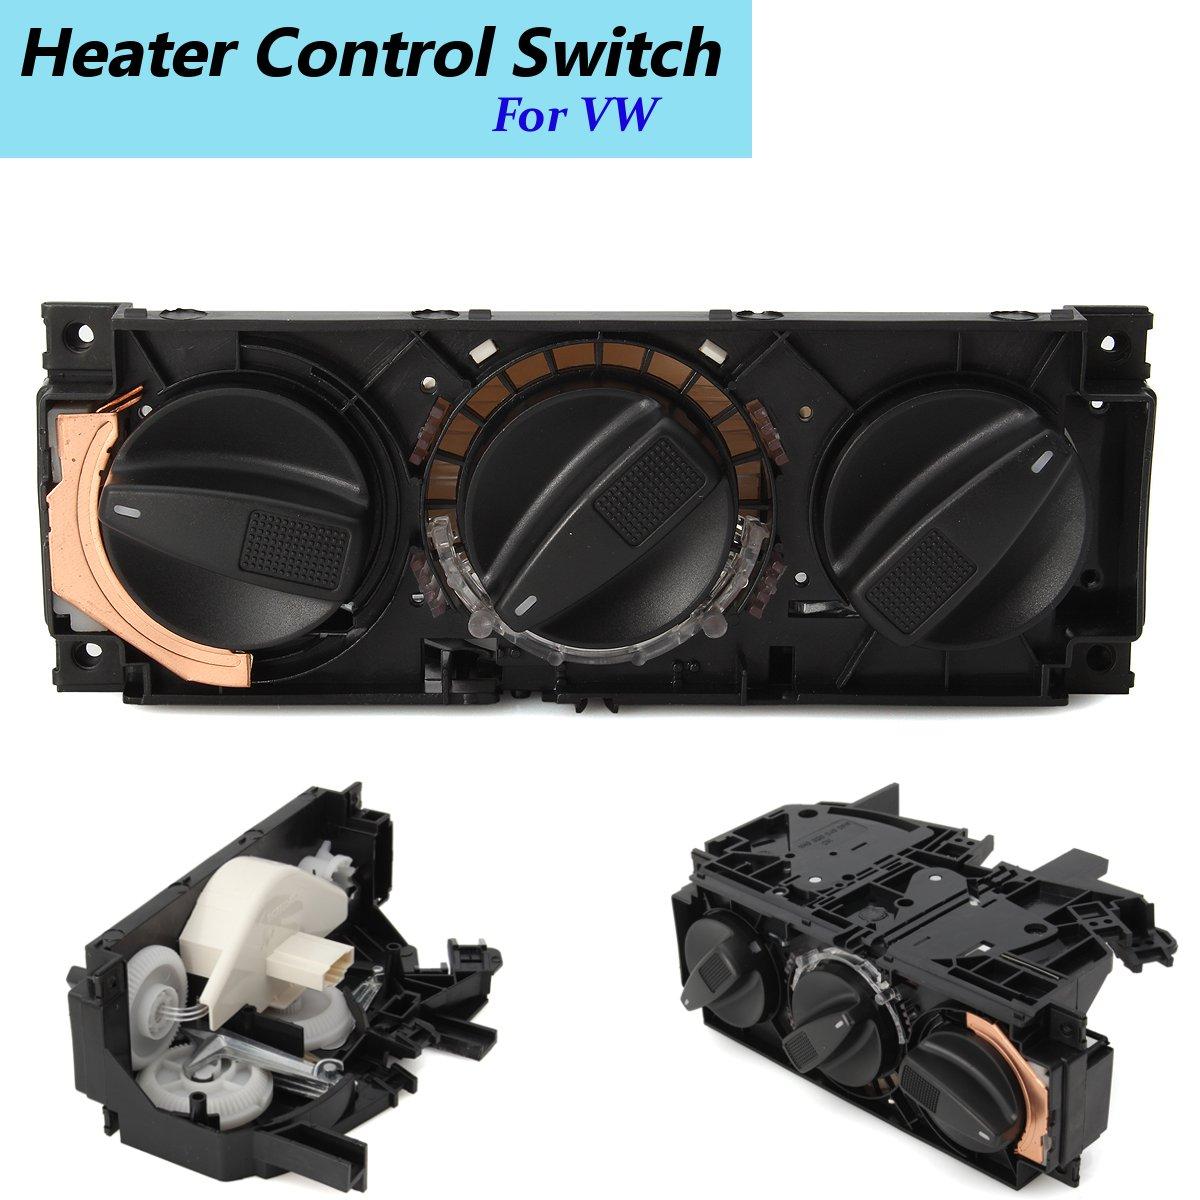 1H0820045D Car A/C Interruptor de Controle do Aquecedor Painel Climate Control Knob Para Volkswagen VW Jetta Golf mk3 Vento Eurovan